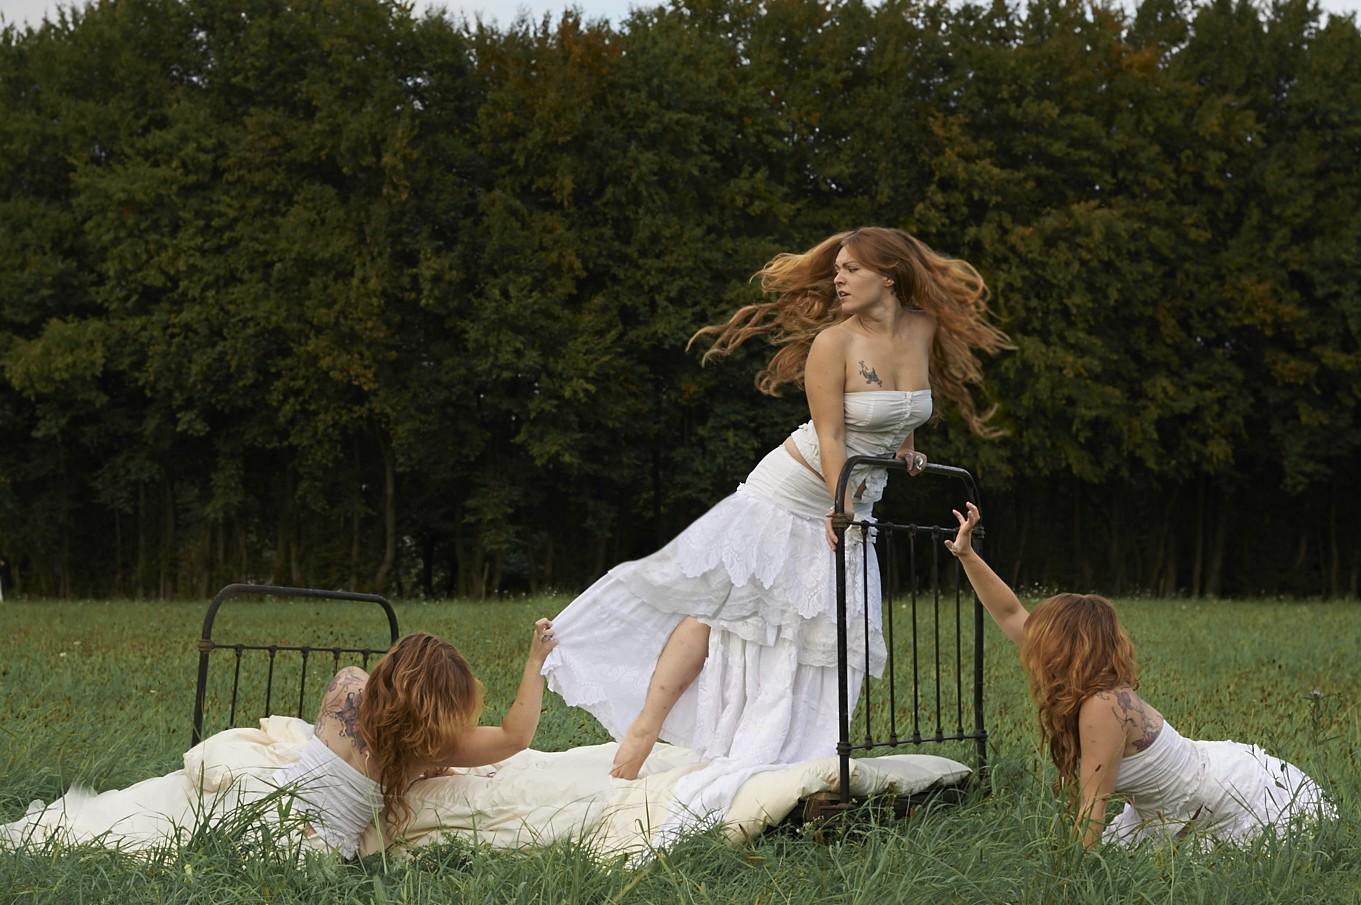 madmoiselle lelaya - nature - graigue - clonage cheveux